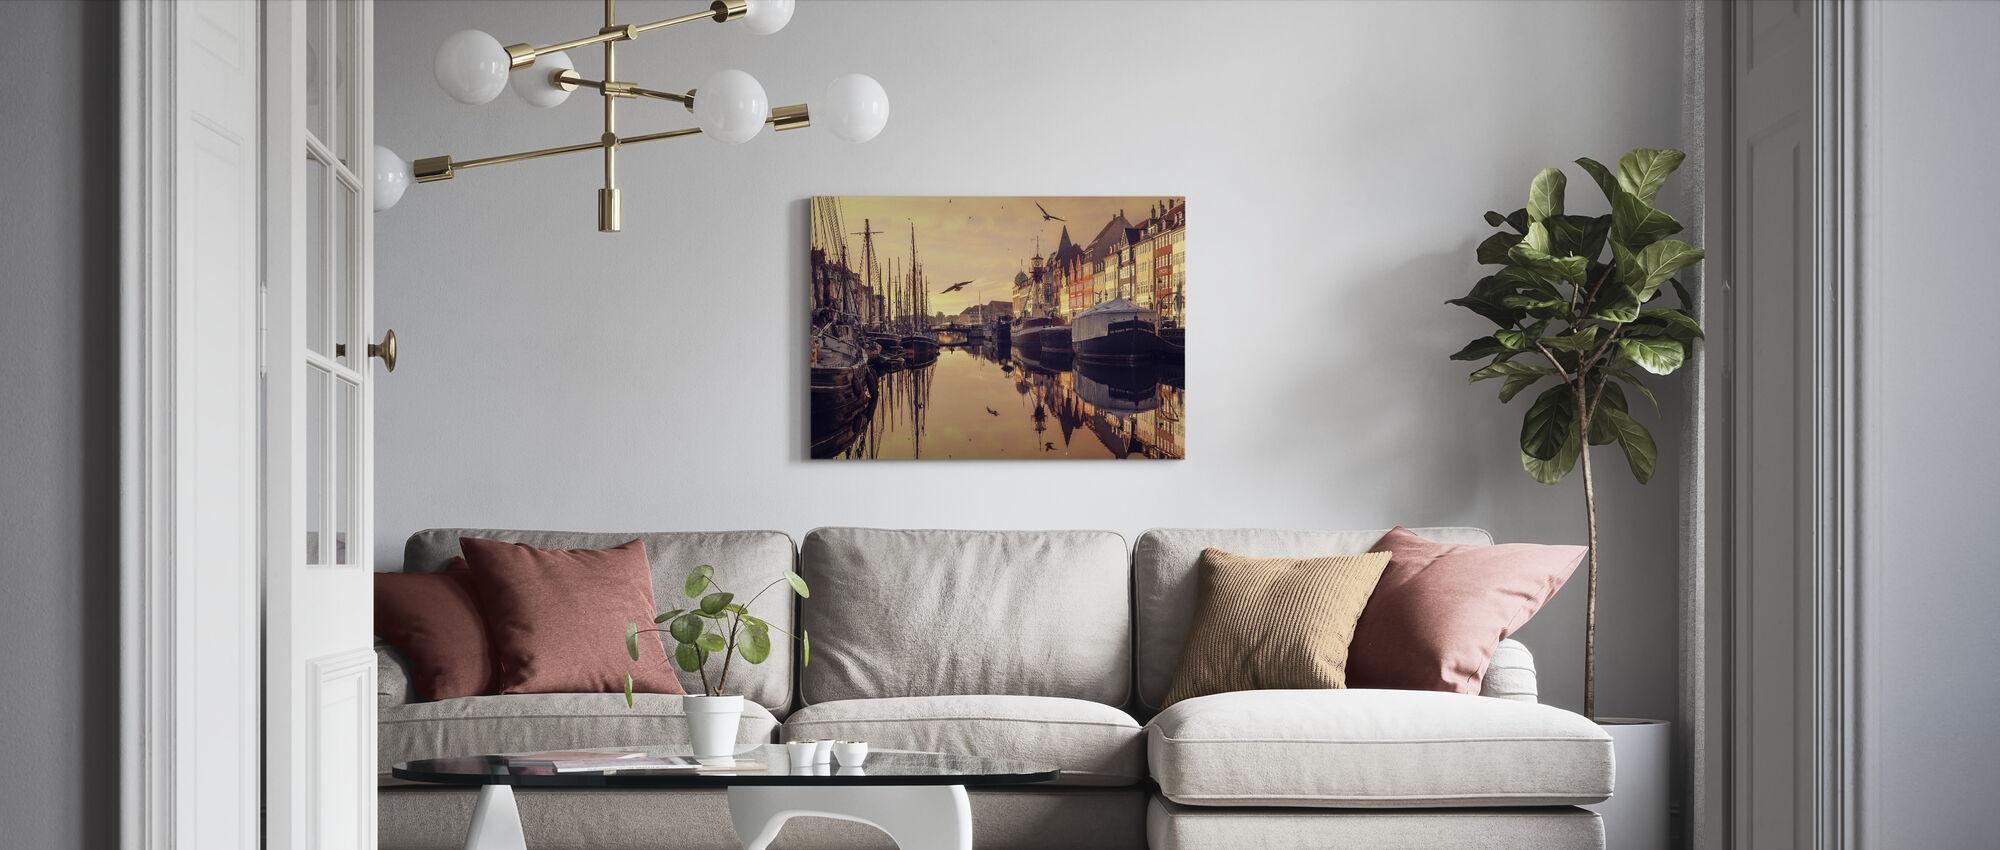 Romantisk København, Danmark - Lerretsbilde - Stue